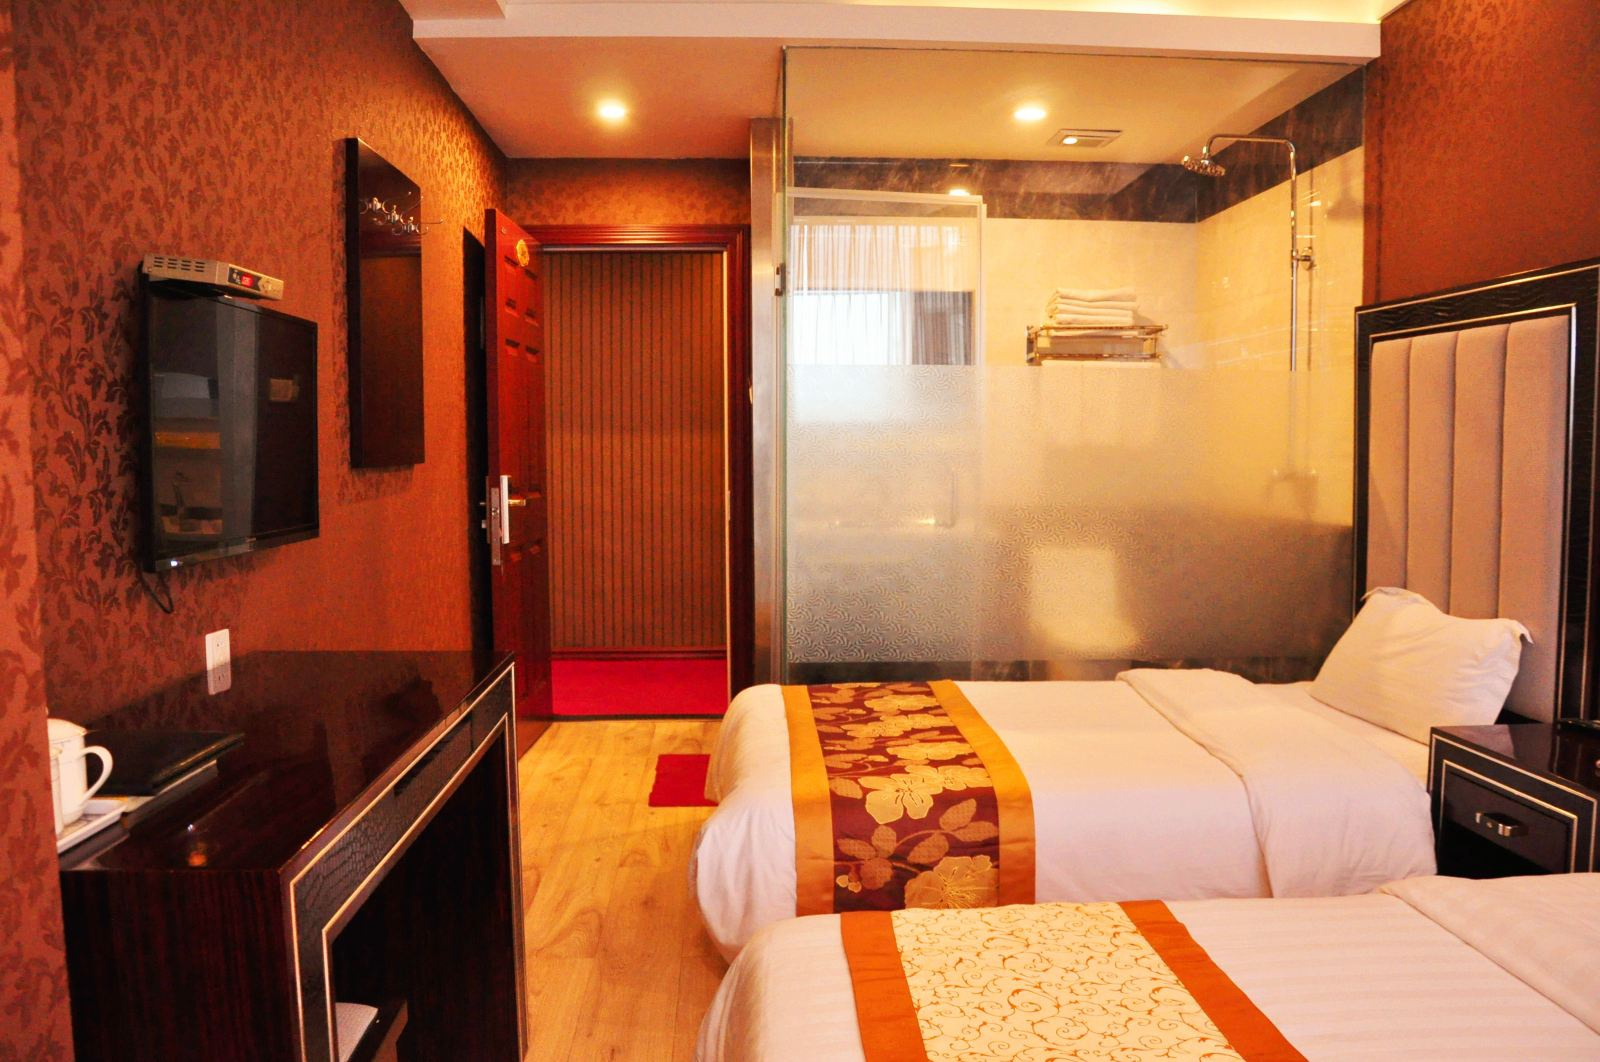 Wanjia Chain Express Hotel - Skyscanner Hotels